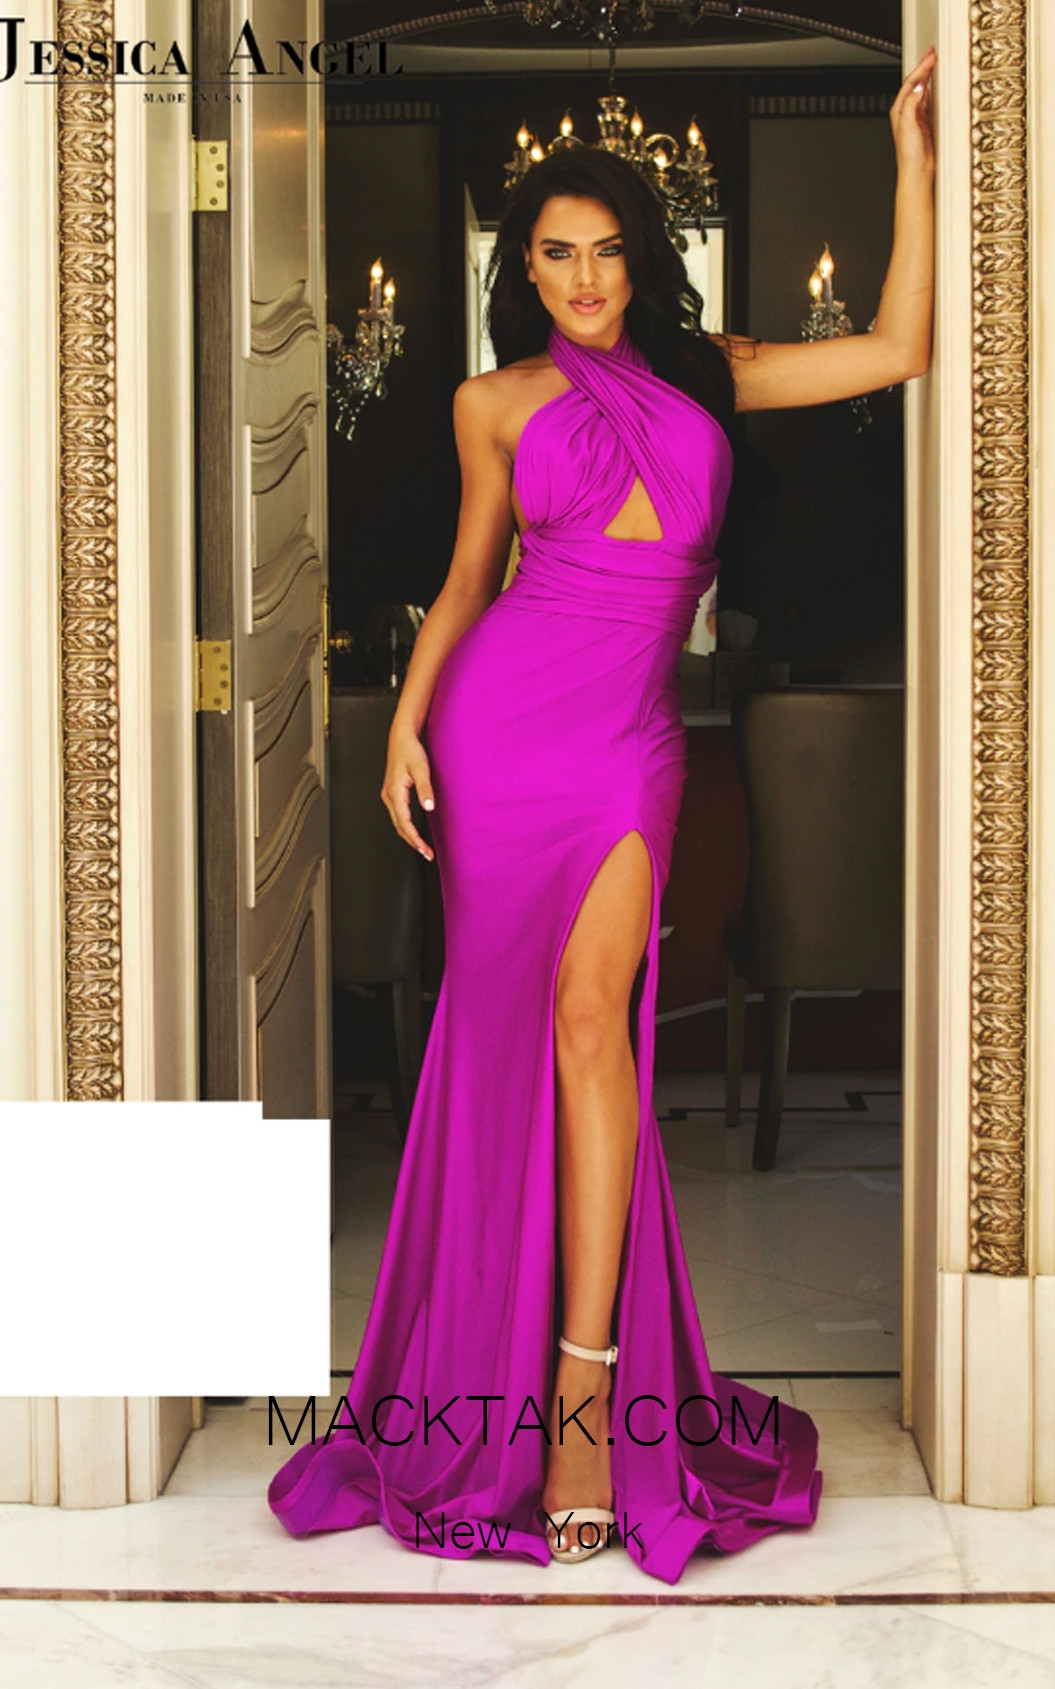 Jessica Angel 738 Front Dress